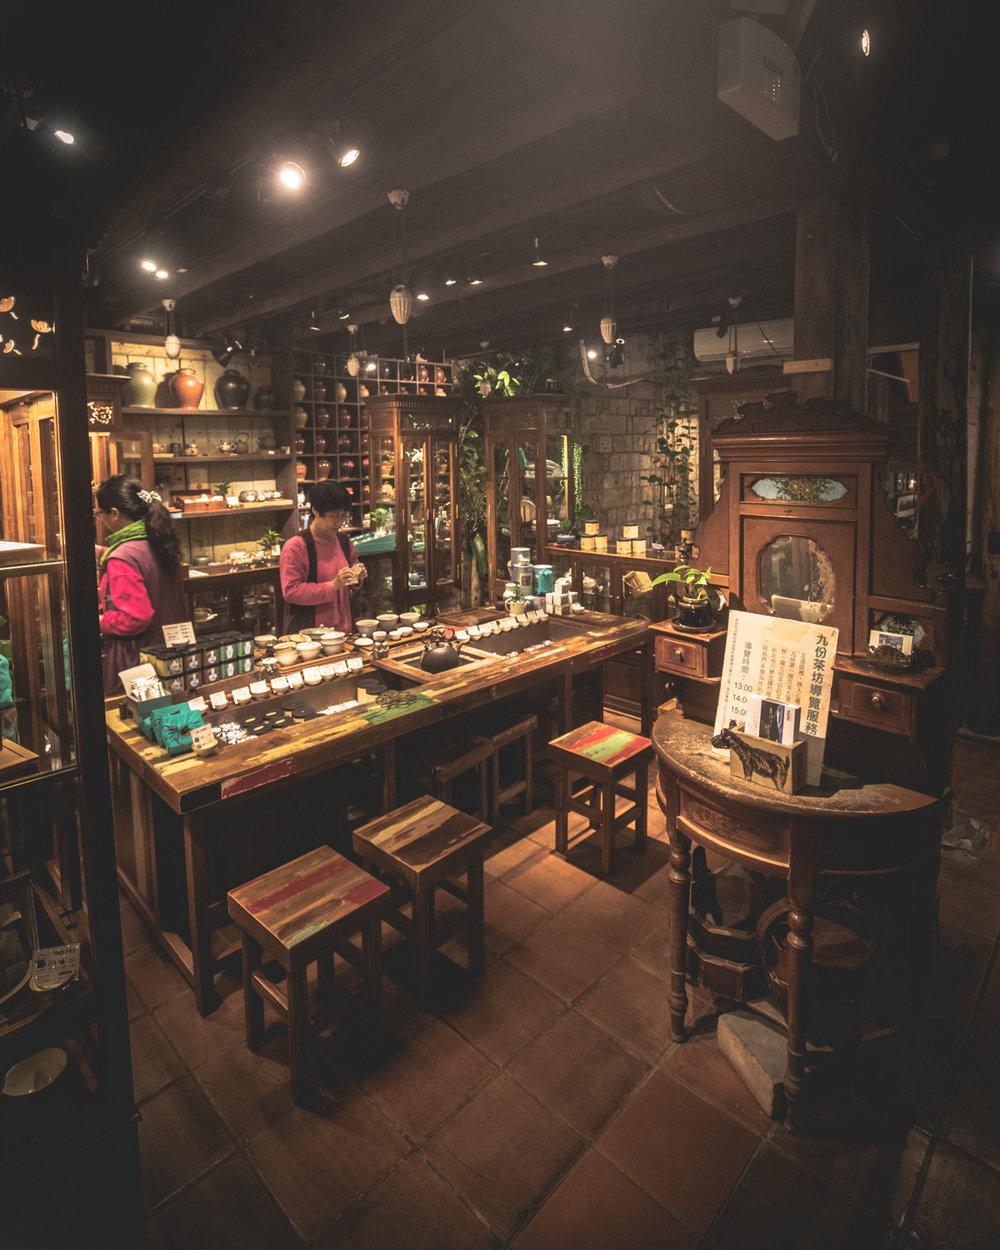 Jiufen Tea House - The inside